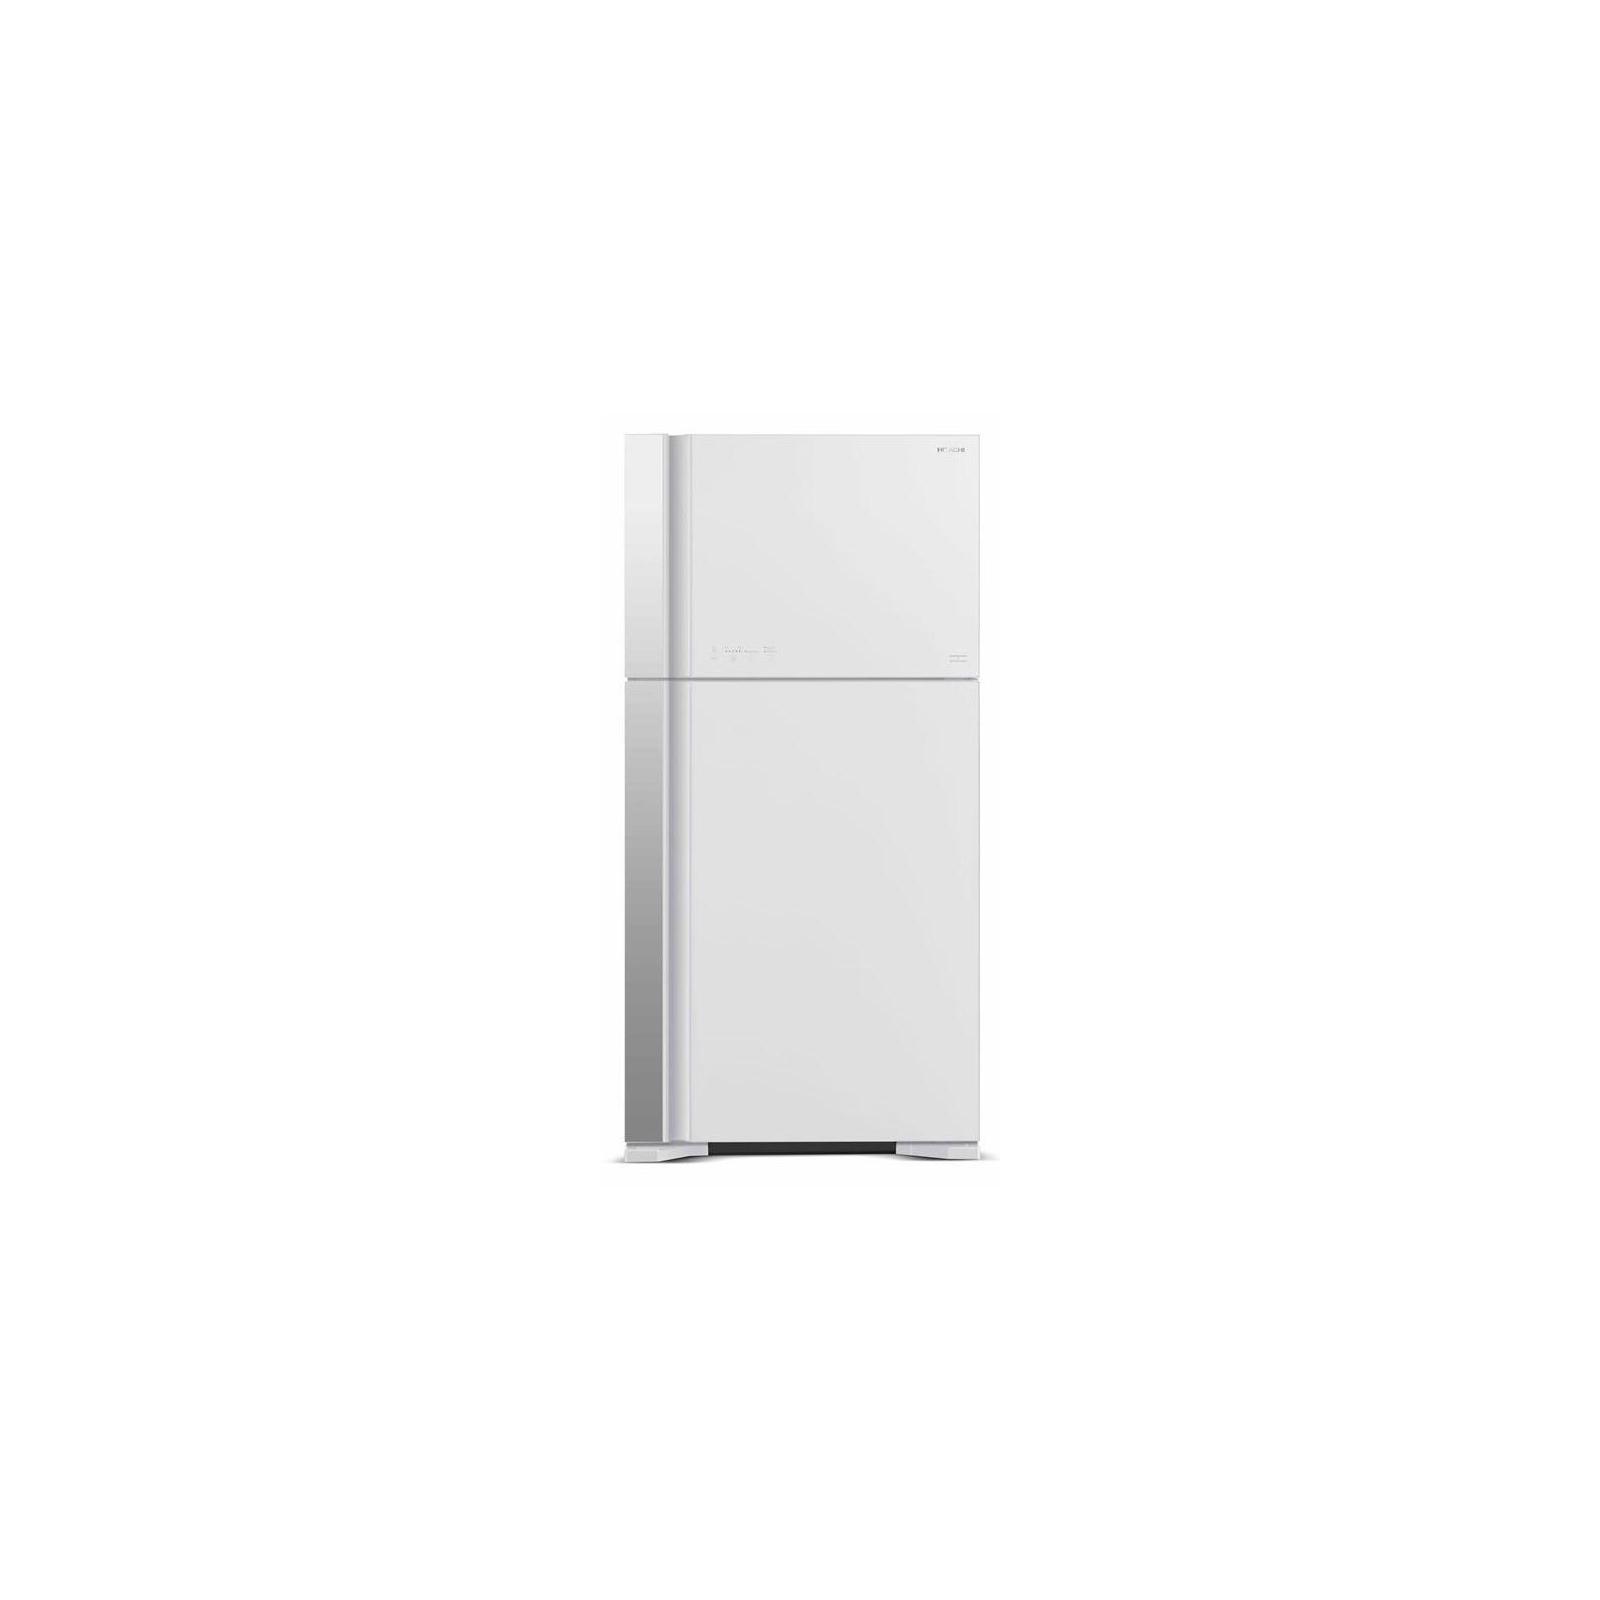 Холодильник Hitachi R-VG660PUC7GPW